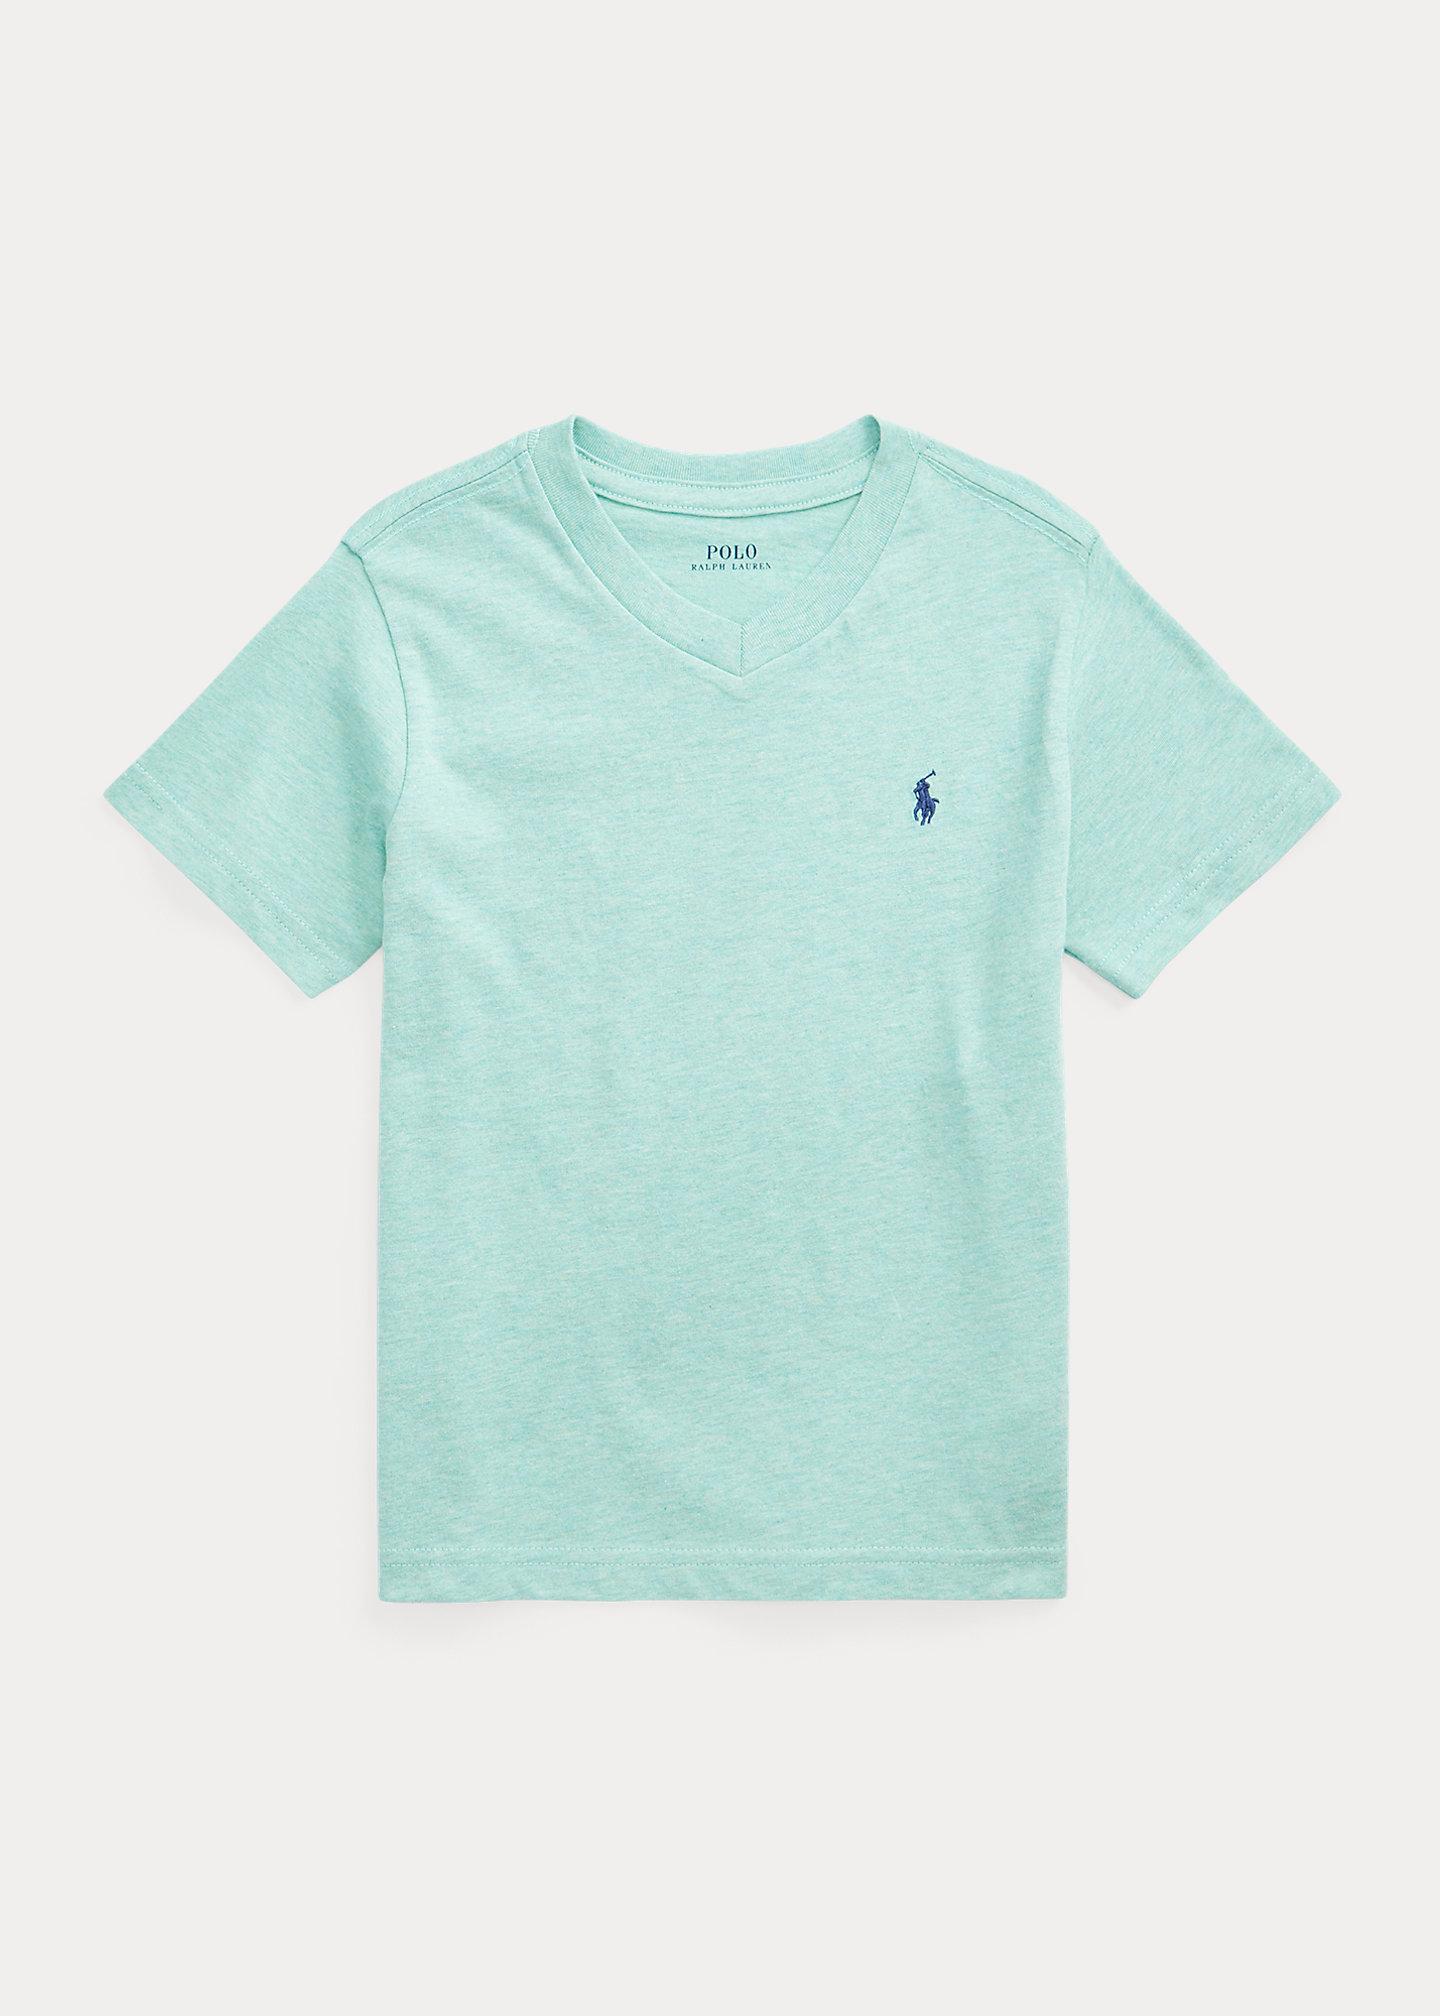 Polo Ralph Lauren Cotton Jersey V Neck Tee